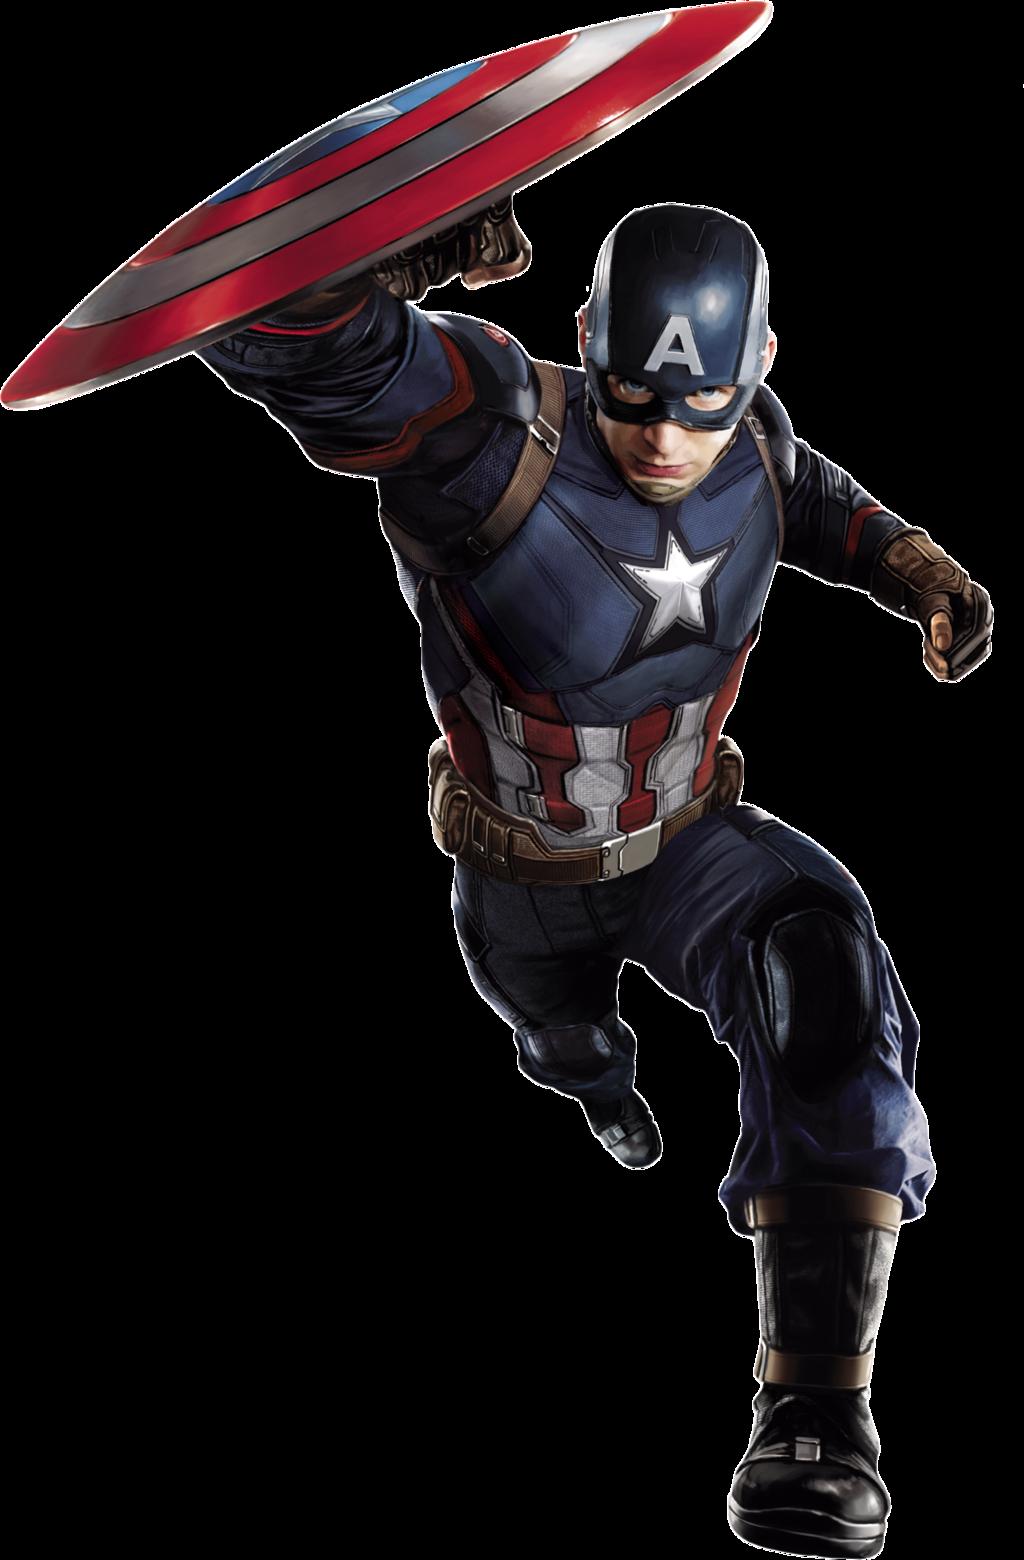 Captain America Png Image Marvel Captain America Captain America Superhero Captain America